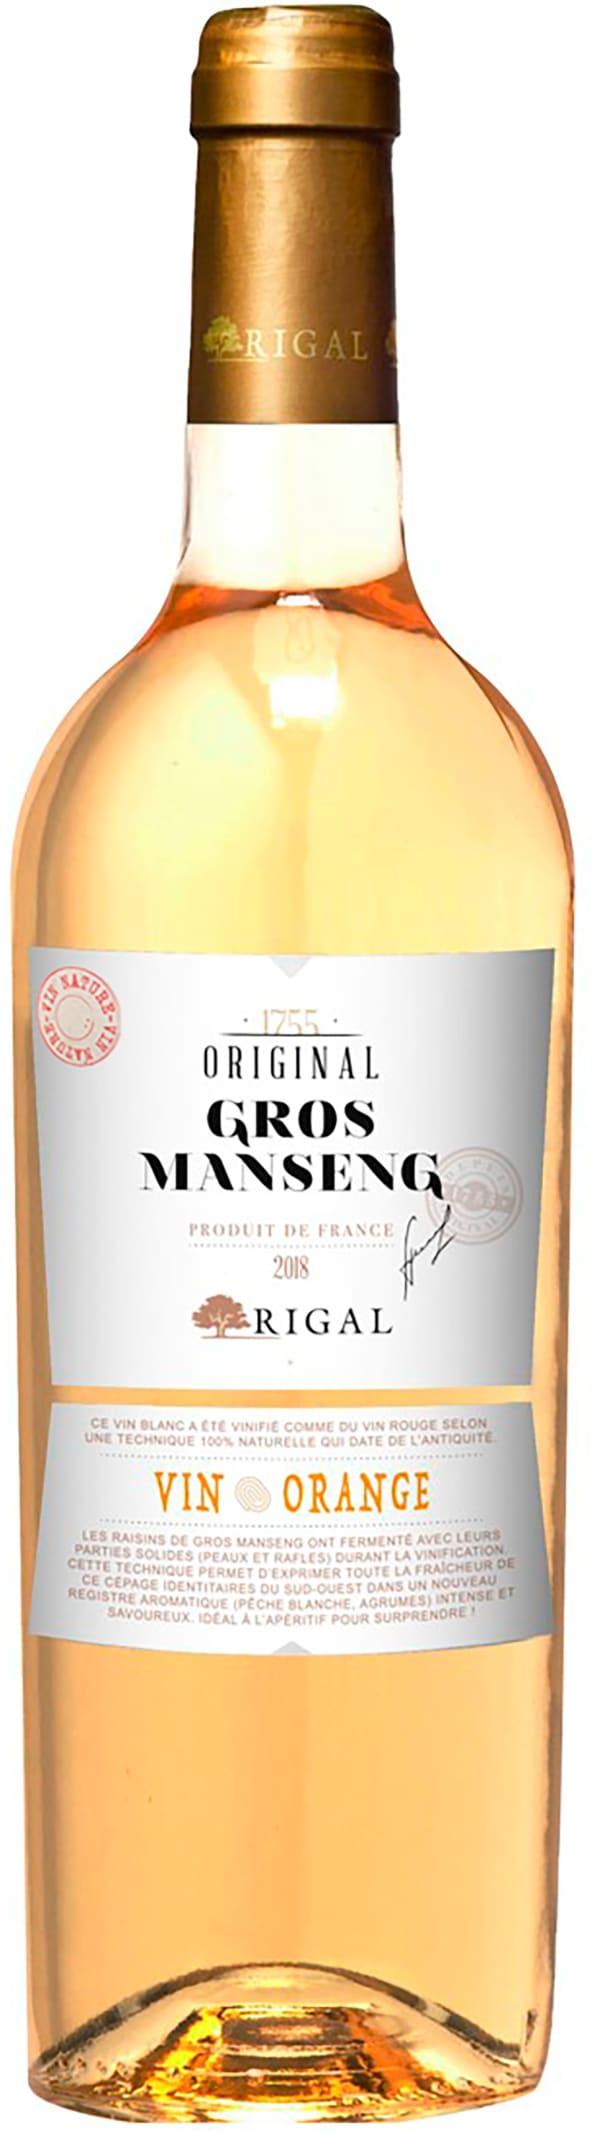 Rigal Original Gros Manseng Vin Orange 2019